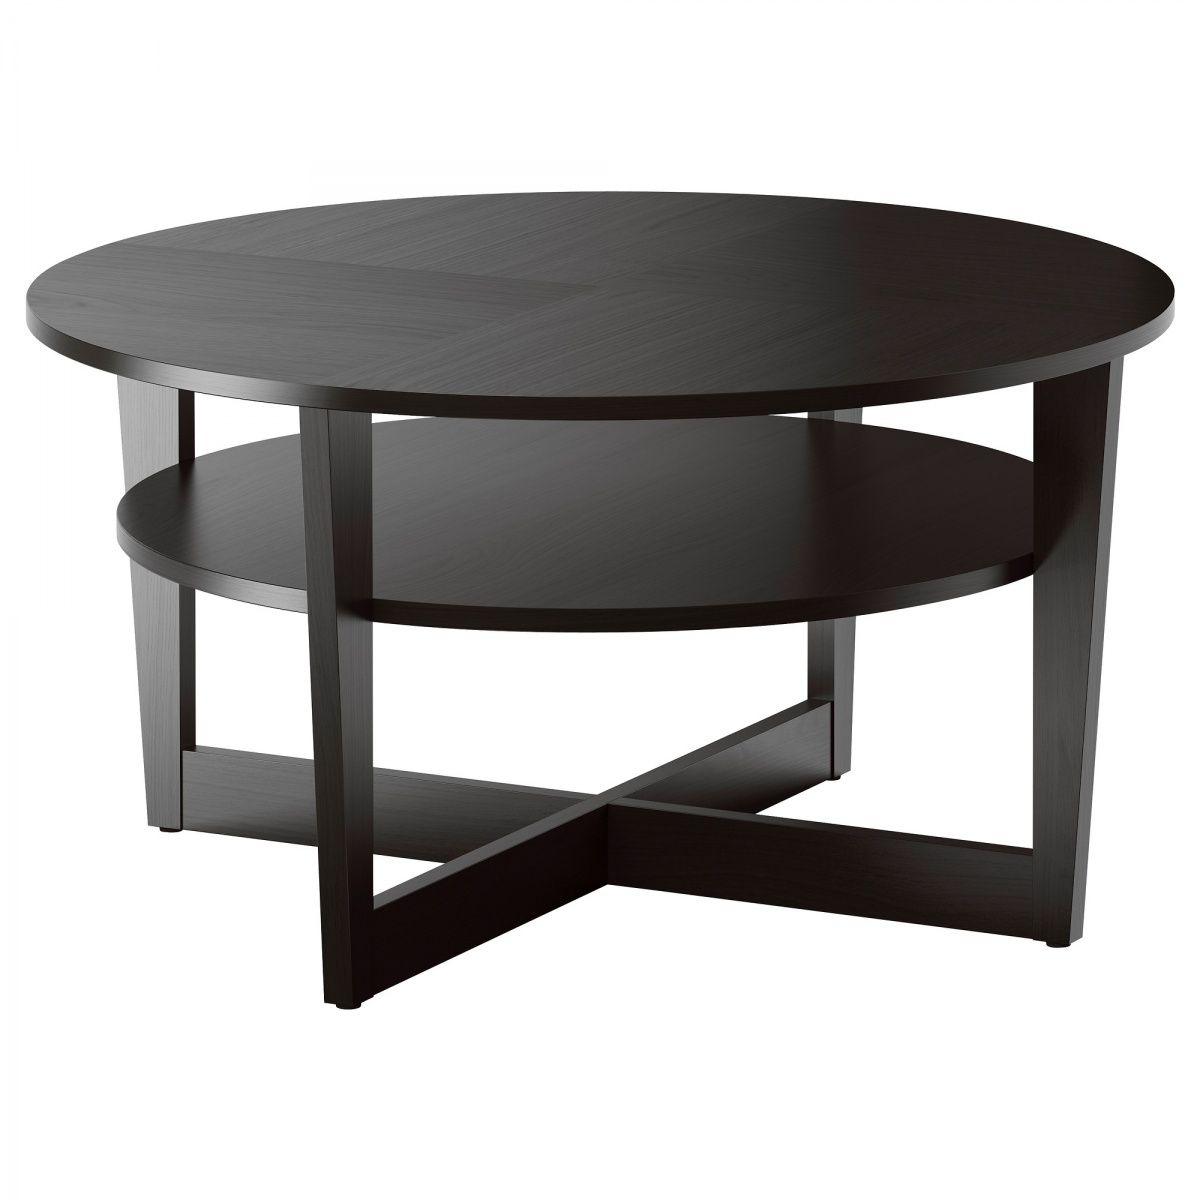 Modern inexpensive ikea coffee tables coffee end tables design modern inexpensive ikea coffee tables coffee end tables design ideas 2015 watchthetrailerfo